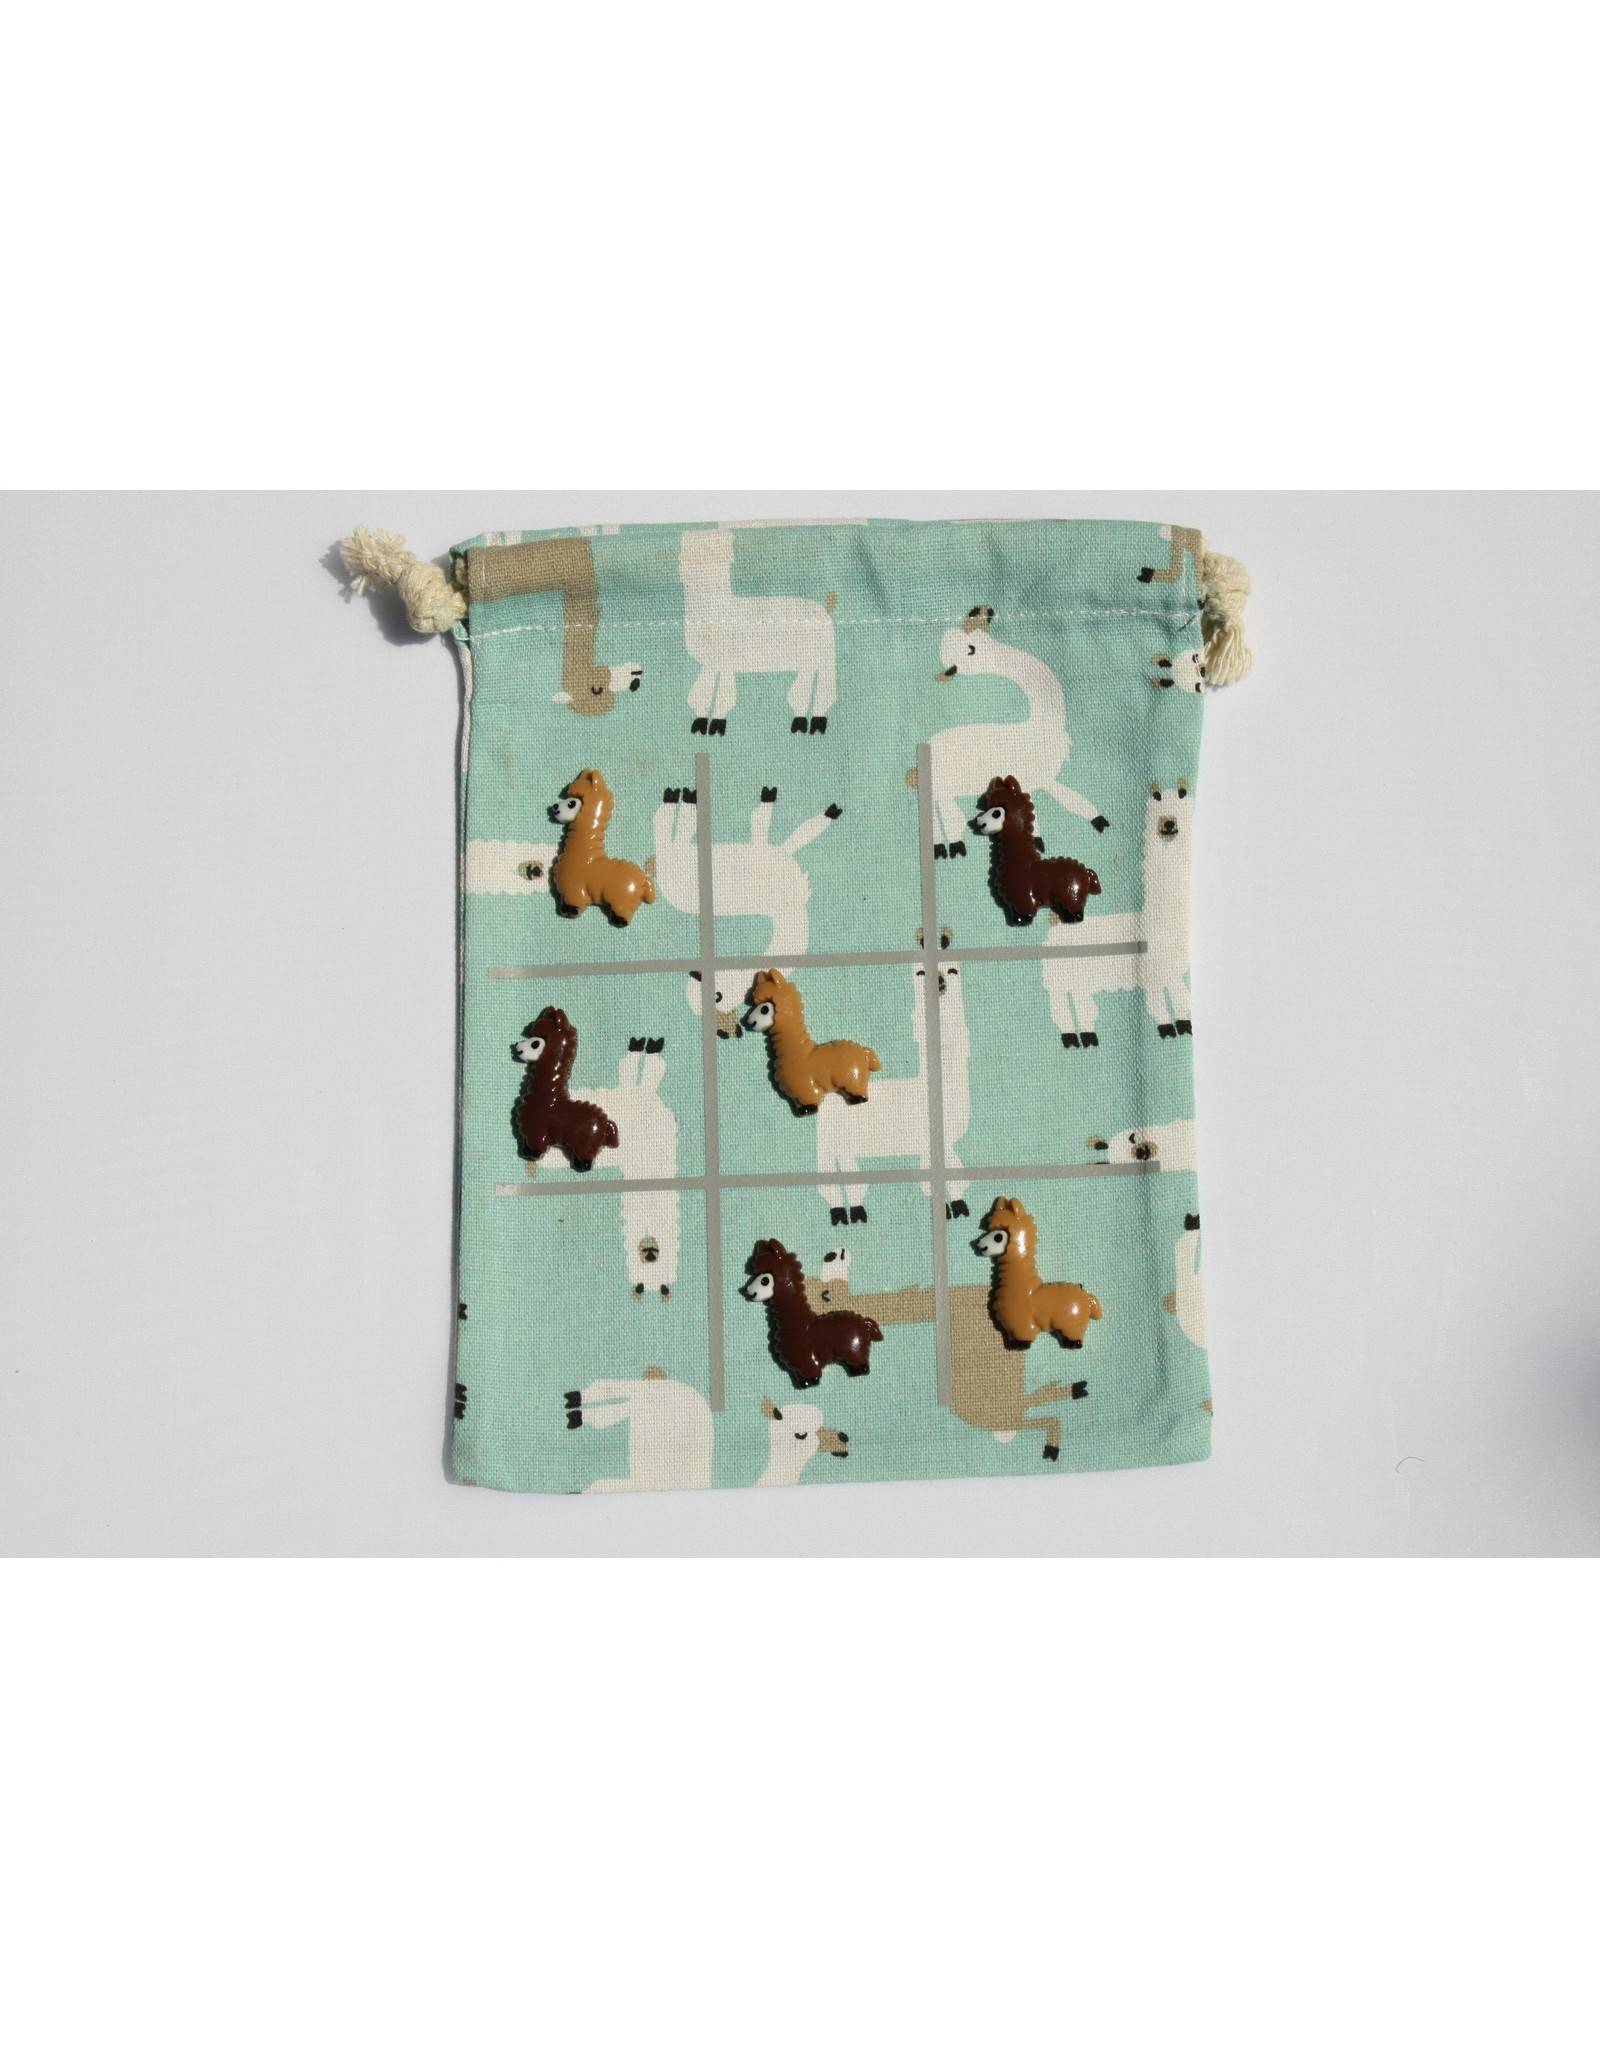 Alpaca Tic-Tac-Toe Game